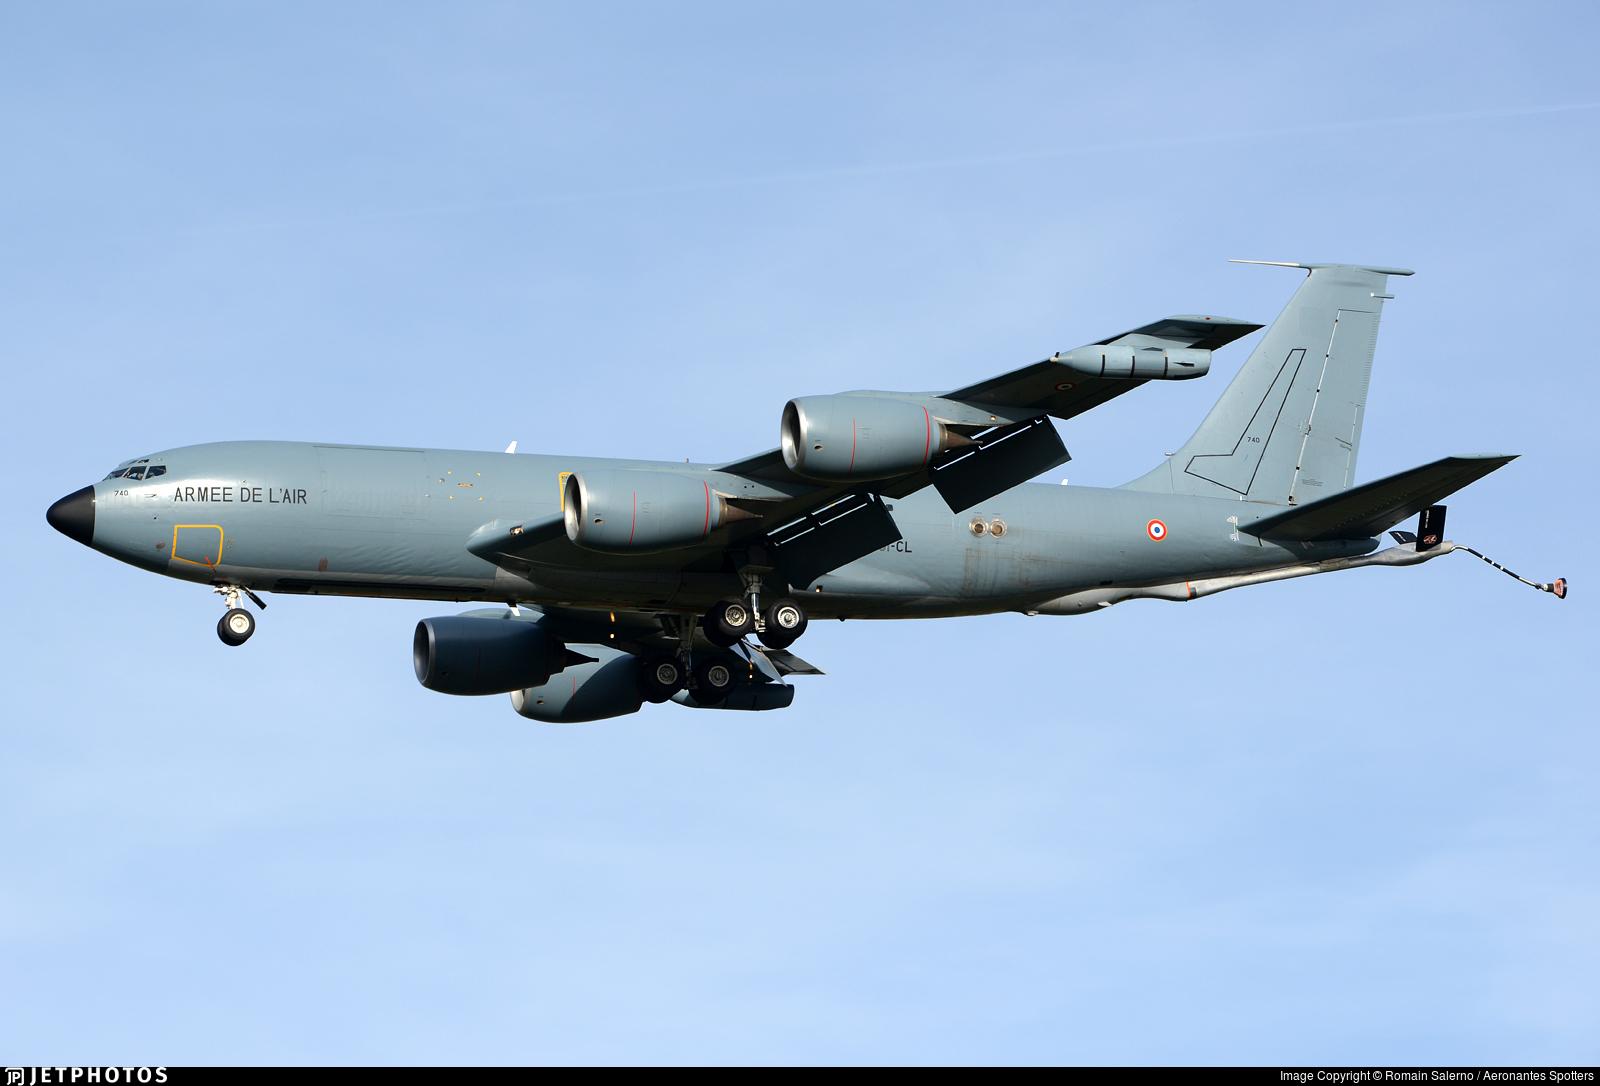 740 - Boeing C-135FR Stratotanker - France - Air Force